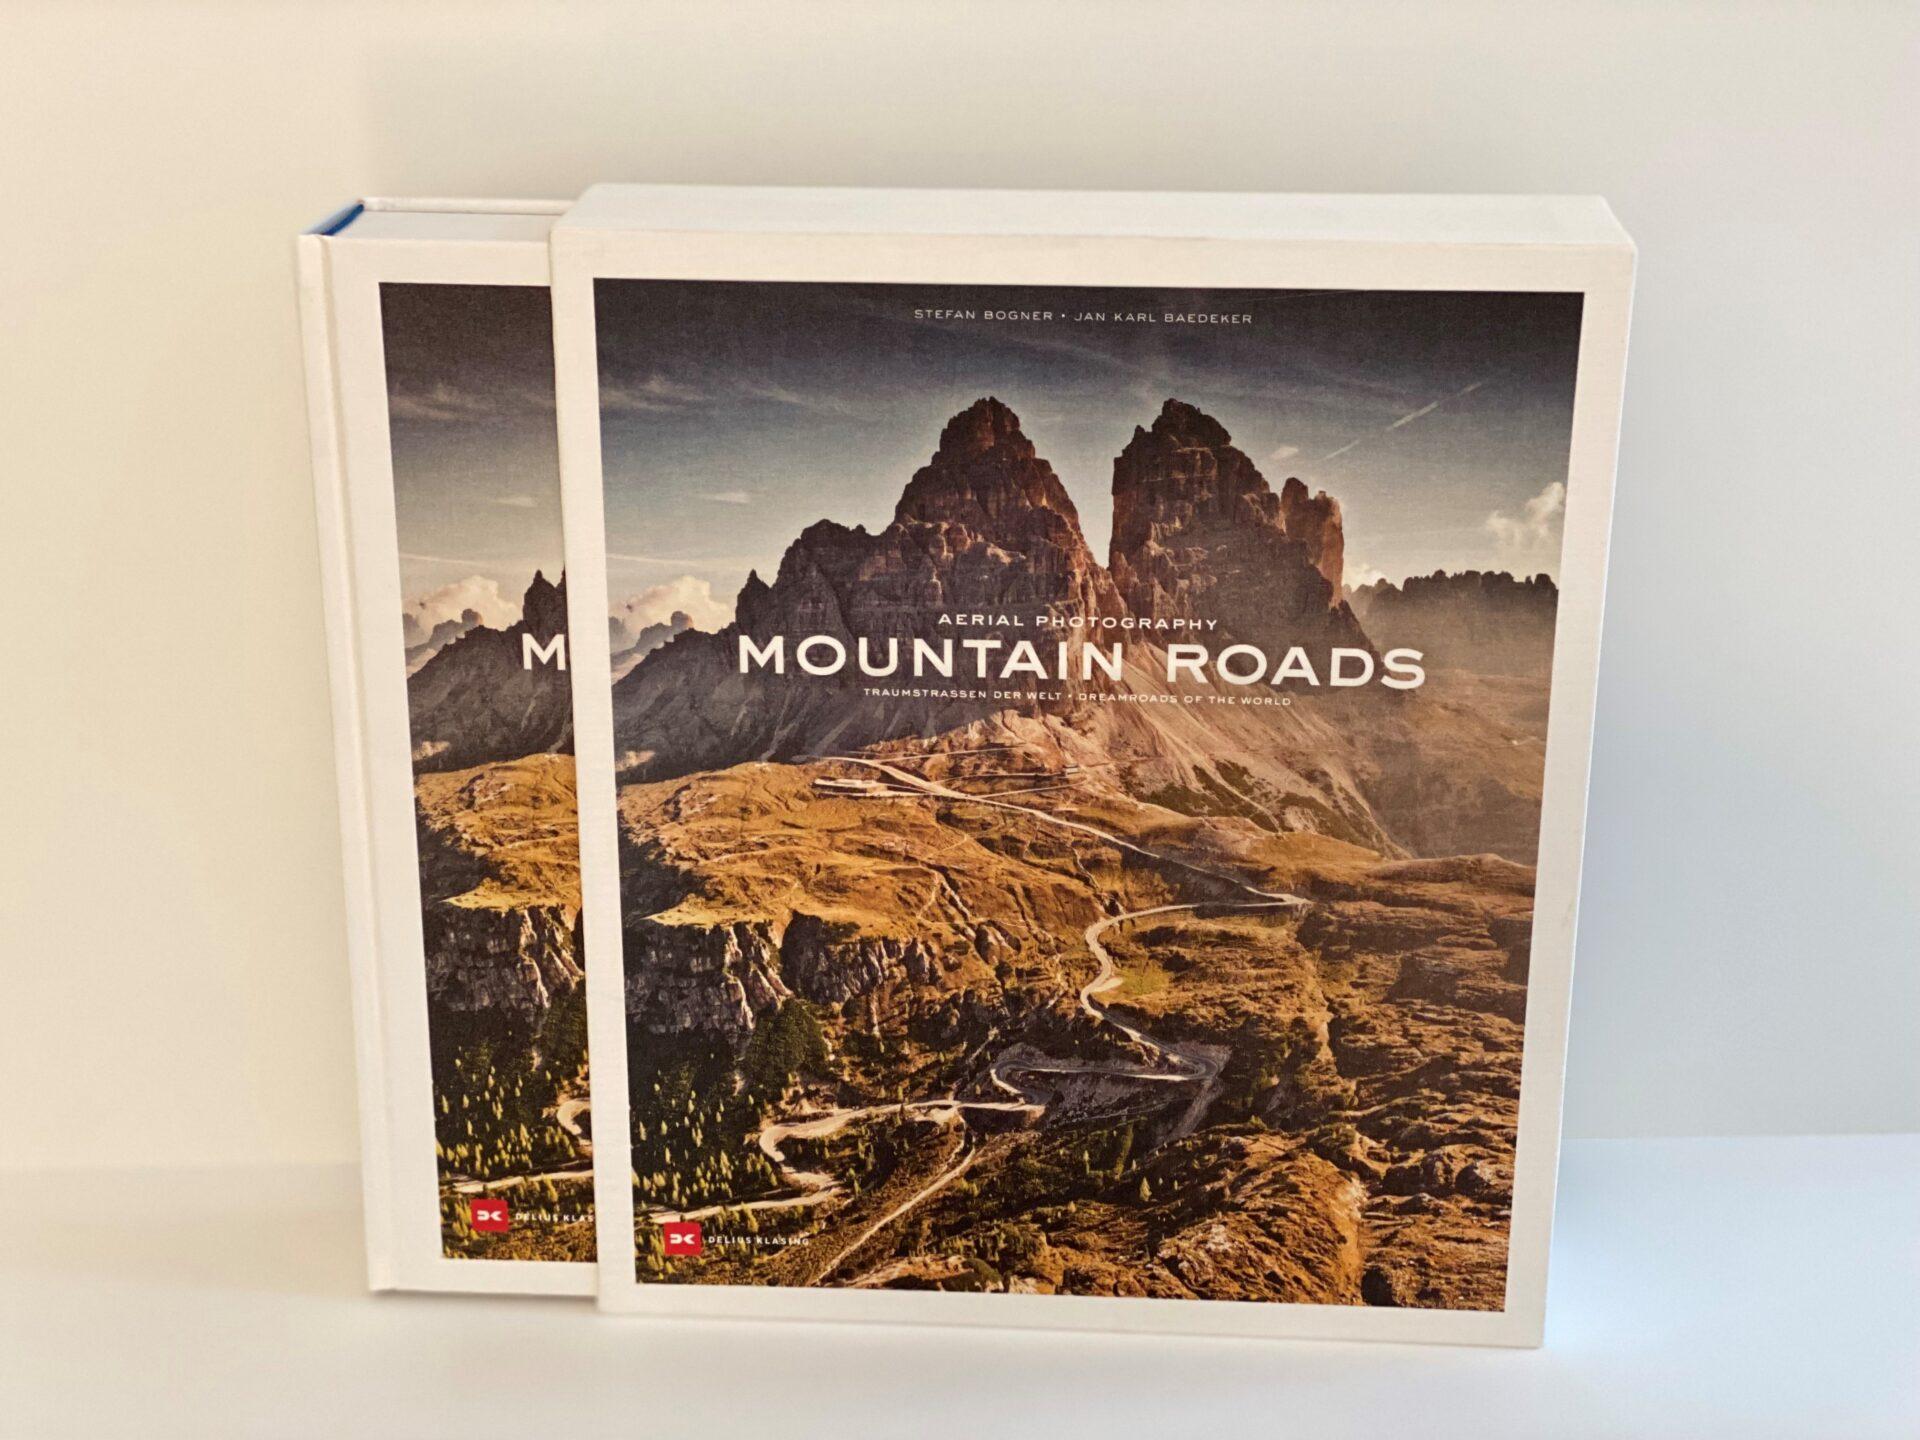 Mountain Roads Delius Klasing